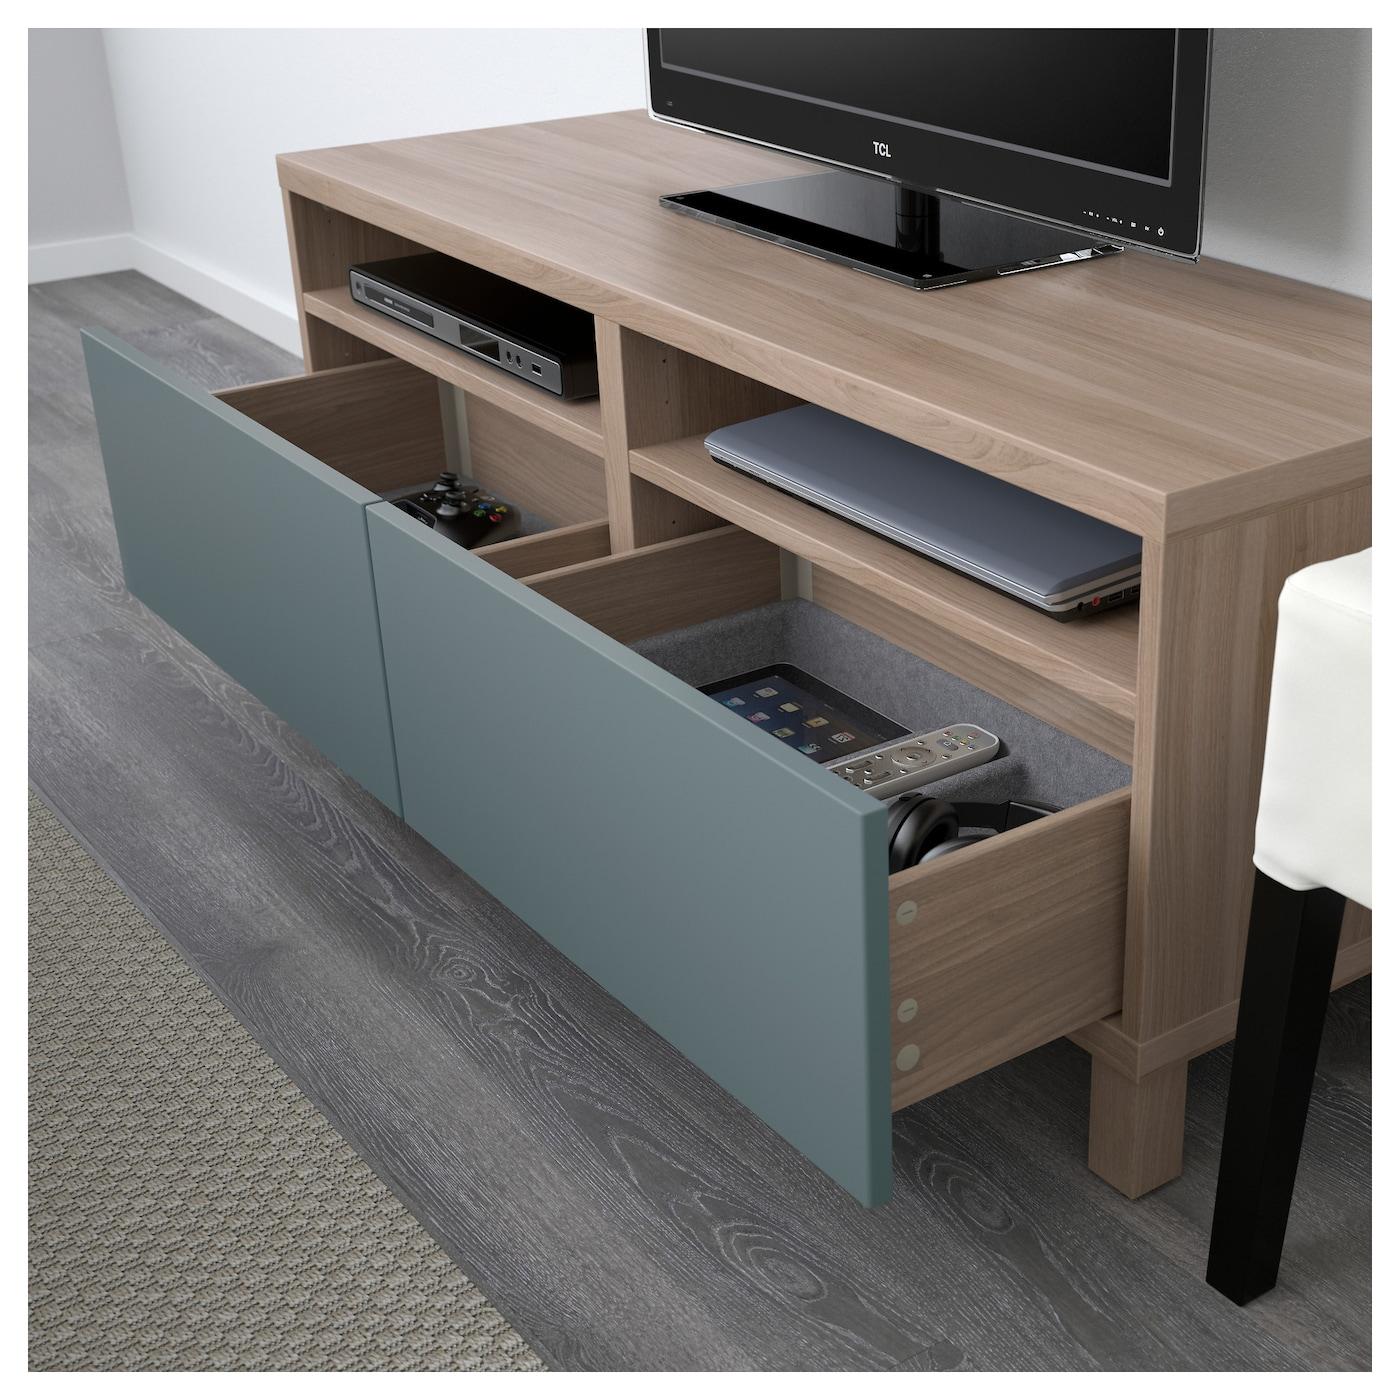 Best mueble tv con almacenaje efecto nogal tinte gris valviken gris turquesa 120 x 40 x 48 cm - Muebles almacenaje ikea ...